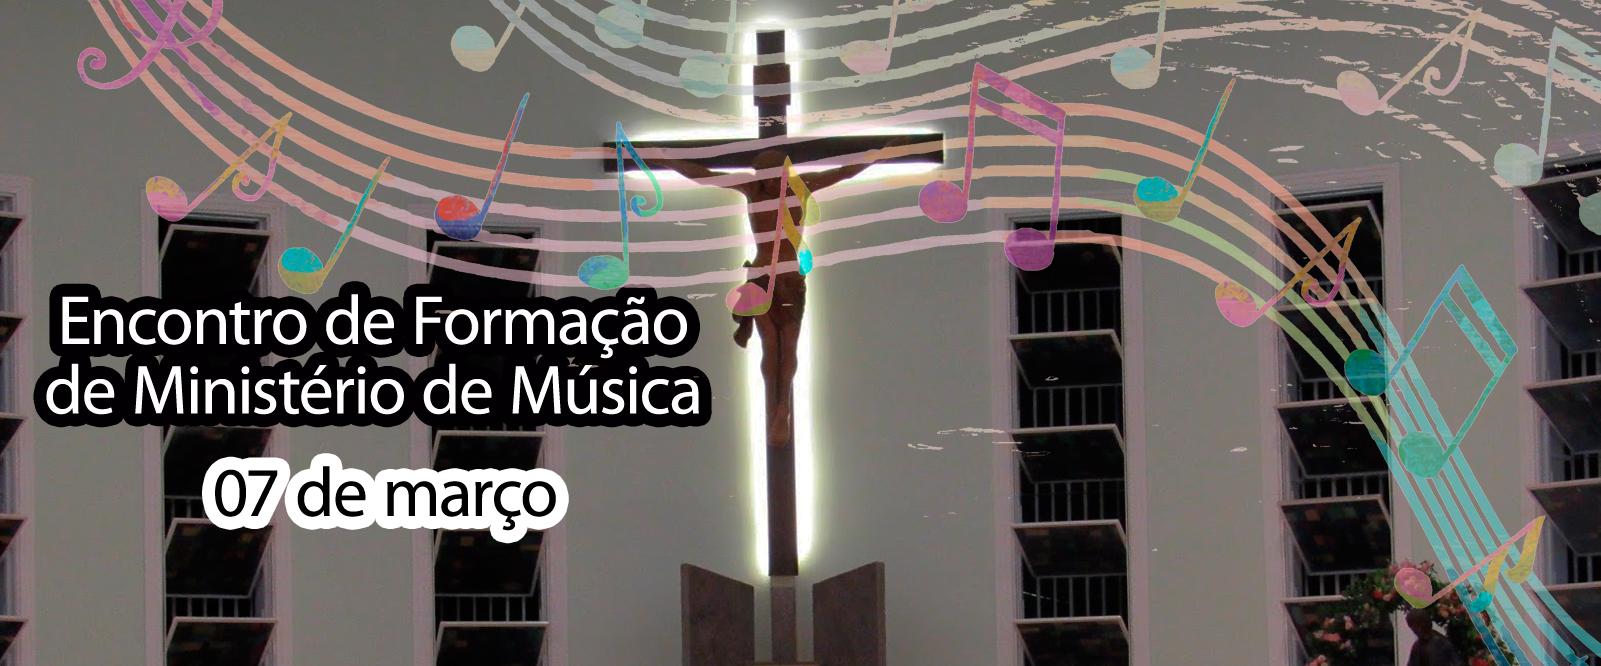 arte-musica-sagrada